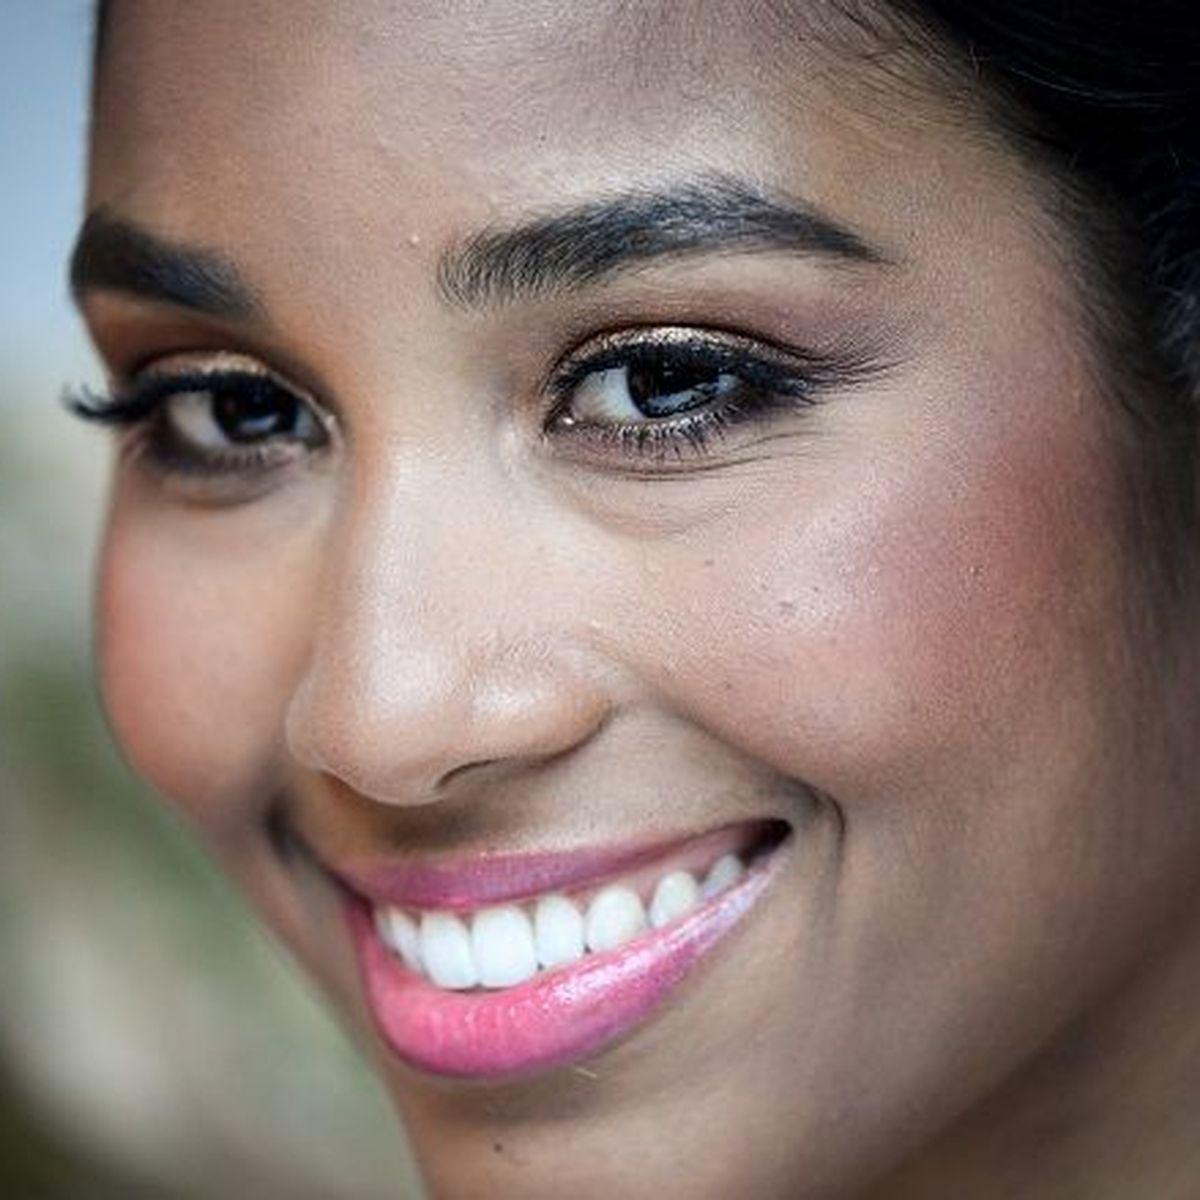 Qui est Clémence Botino, Miss Guadeloupe, élue Miss France 2020 ?